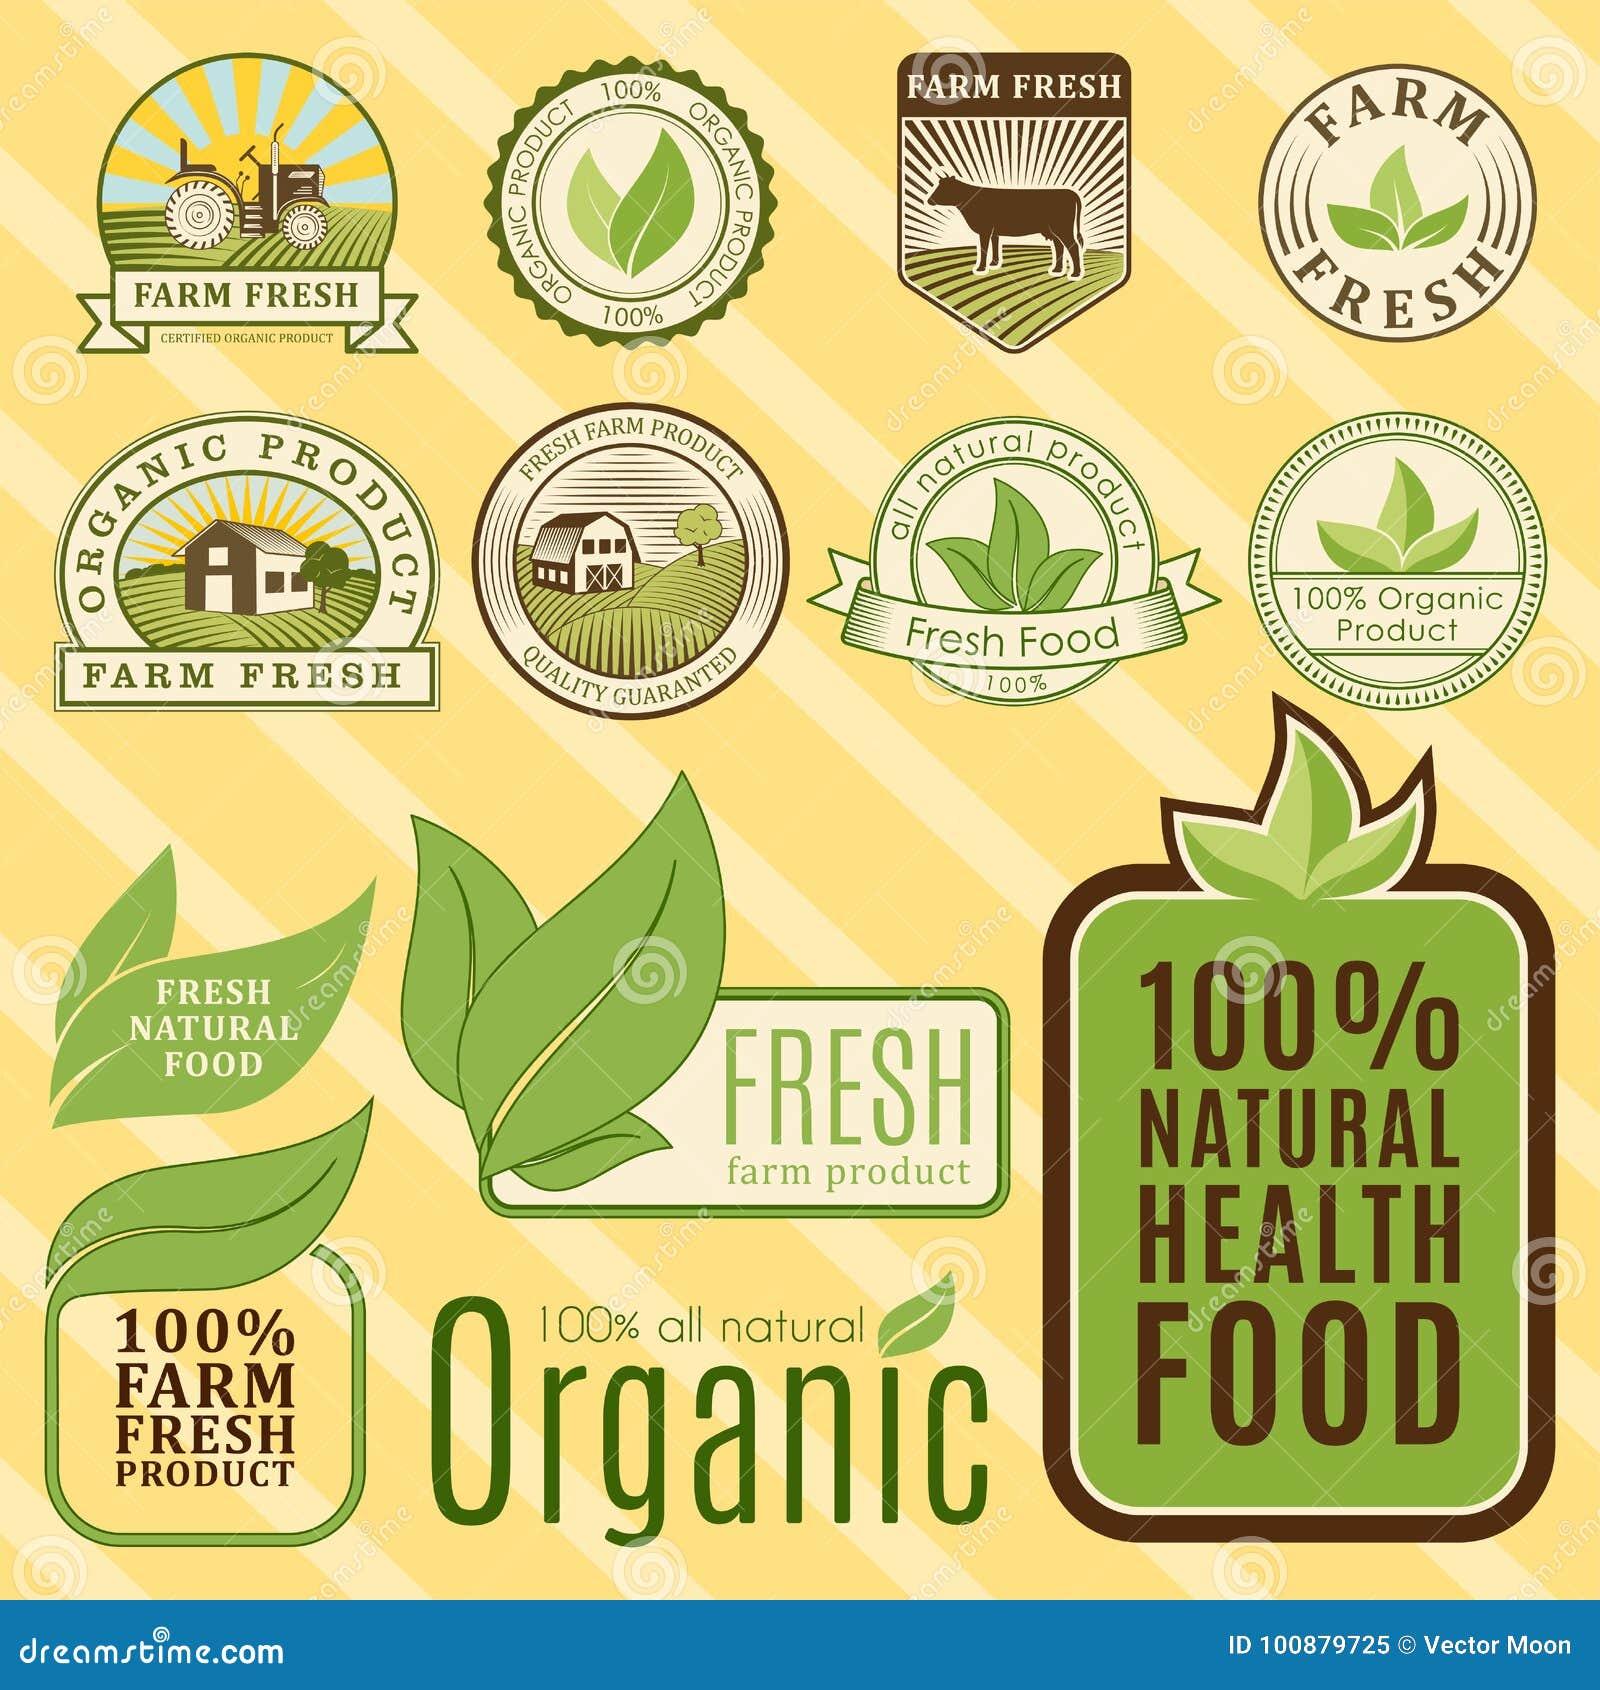 Bio Farm Organic Eco Healthy Food Templates And Vintage